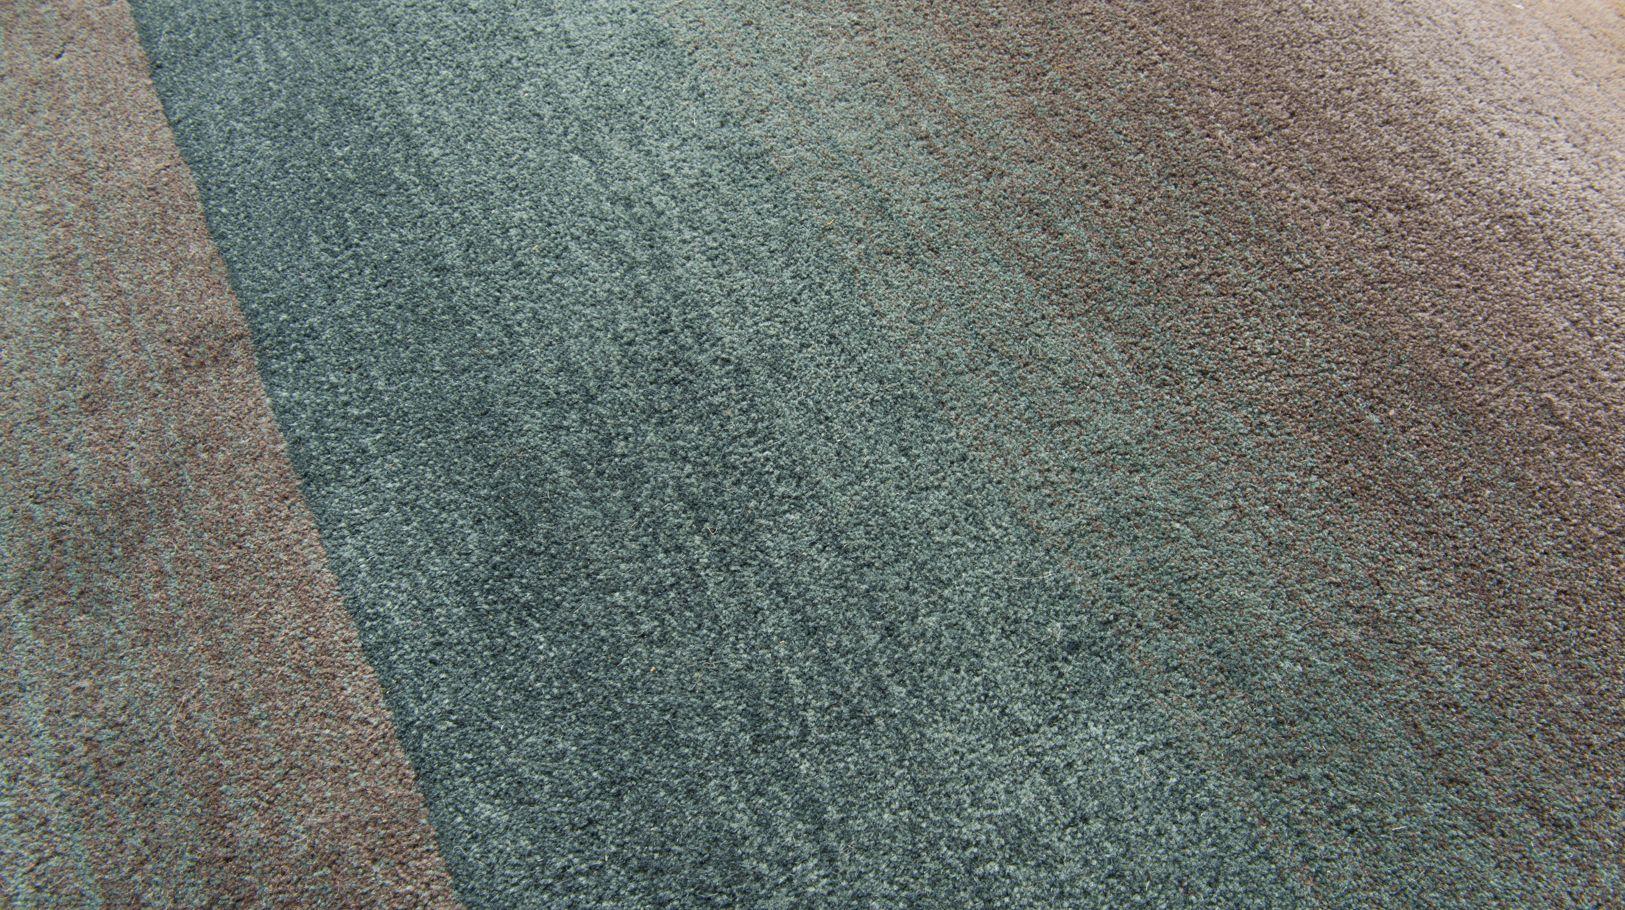 shading 2 shading 2 rug small roche bobois. Black Bedroom Furniture Sets. Home Design Ideas